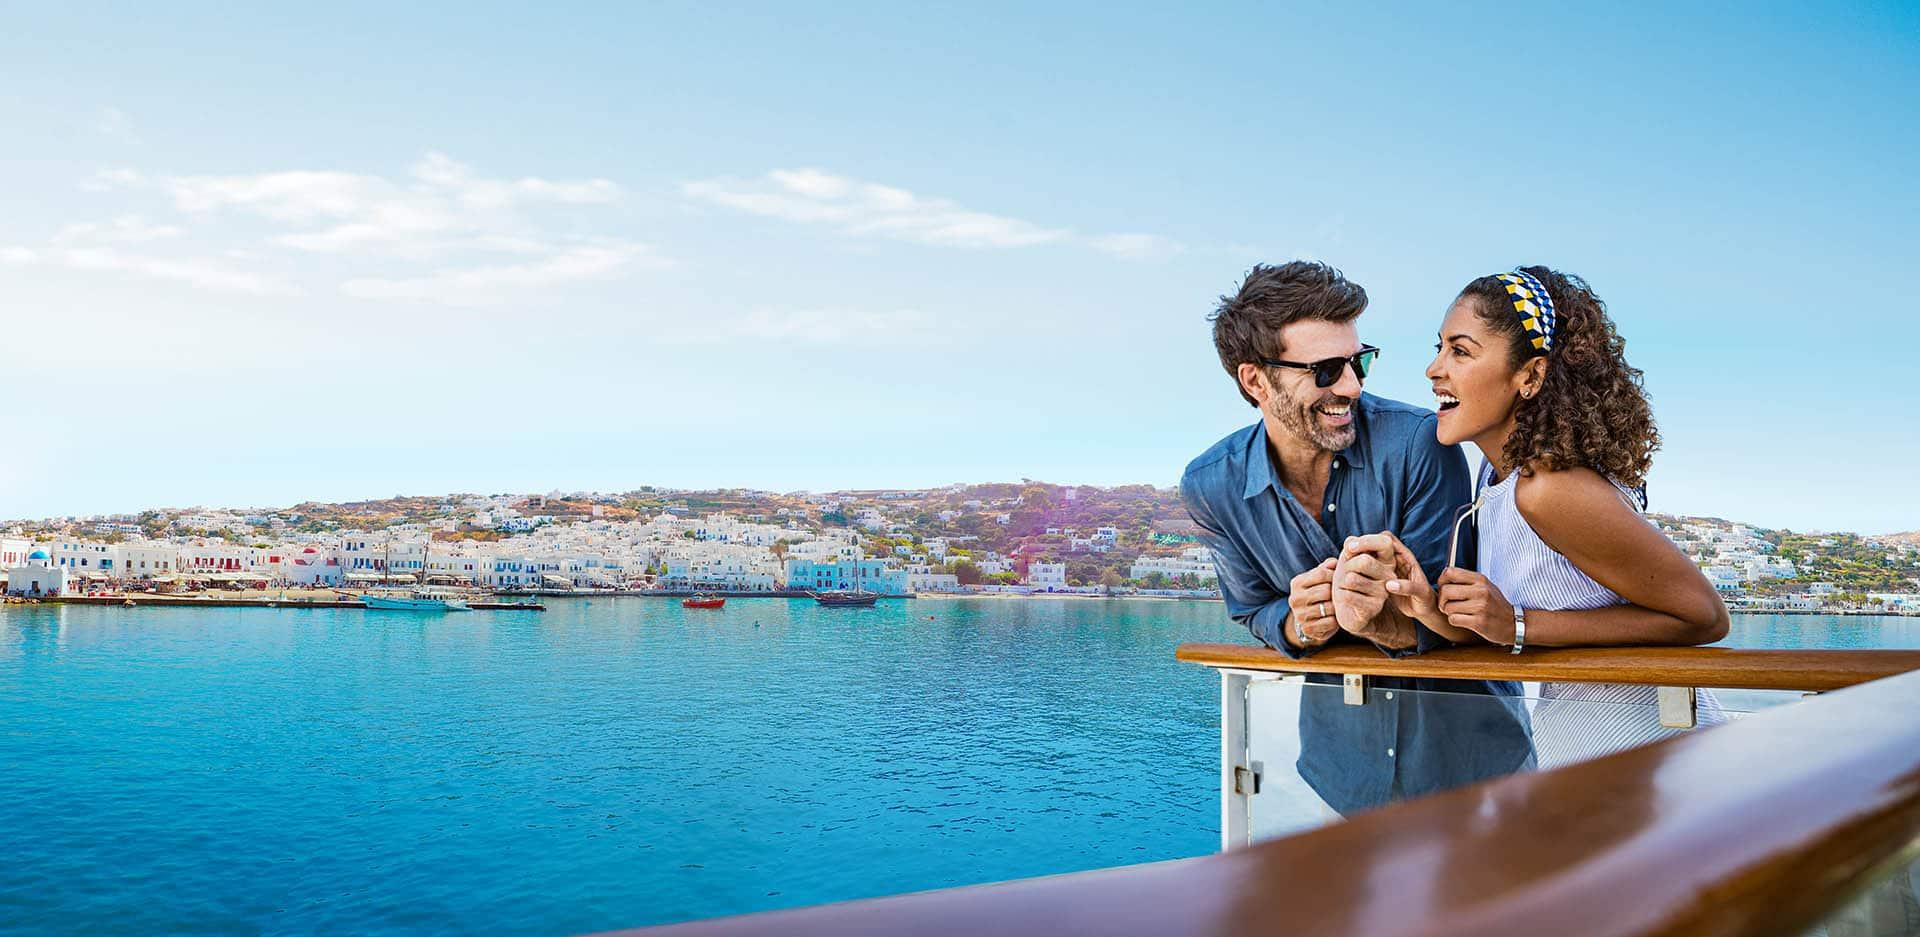 איי יוון: סנטוריני, מיקונוס ופירנצה